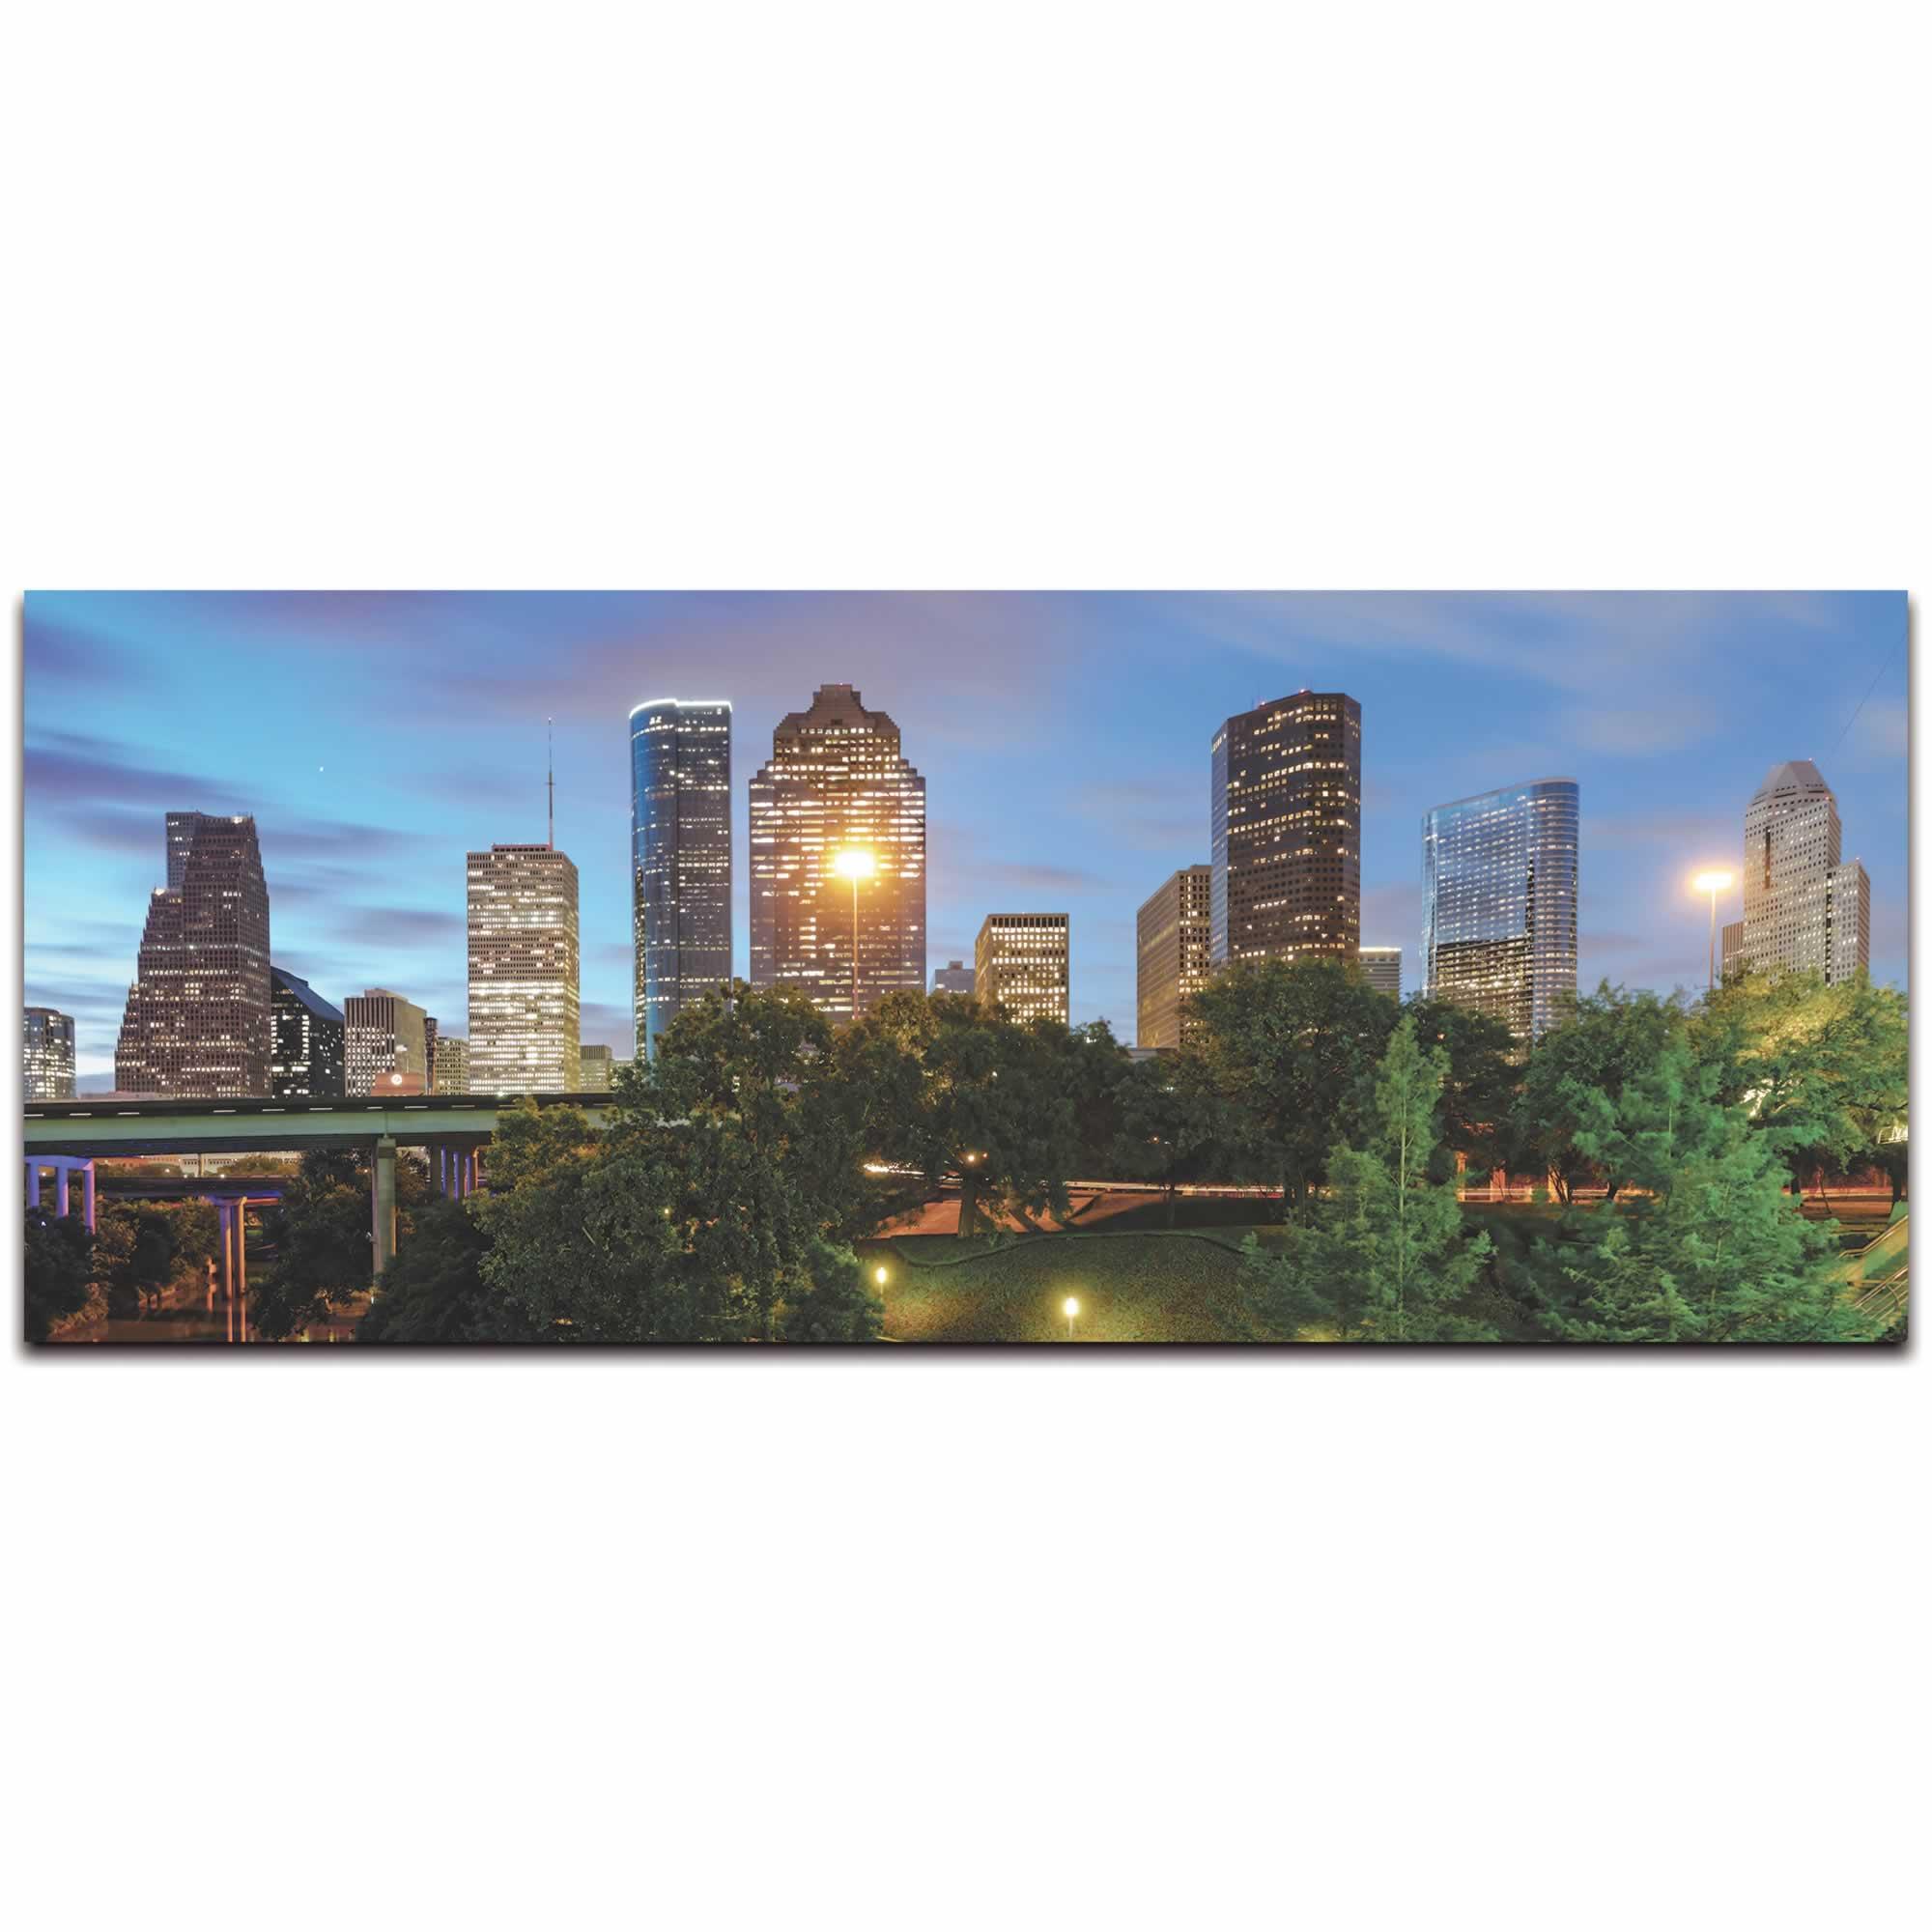 Houston City Skyline - Urban Modern Art, Designer Home Decor, Cityscape Wall Artwork, Trendy Contemporary Art - Alternate View 2